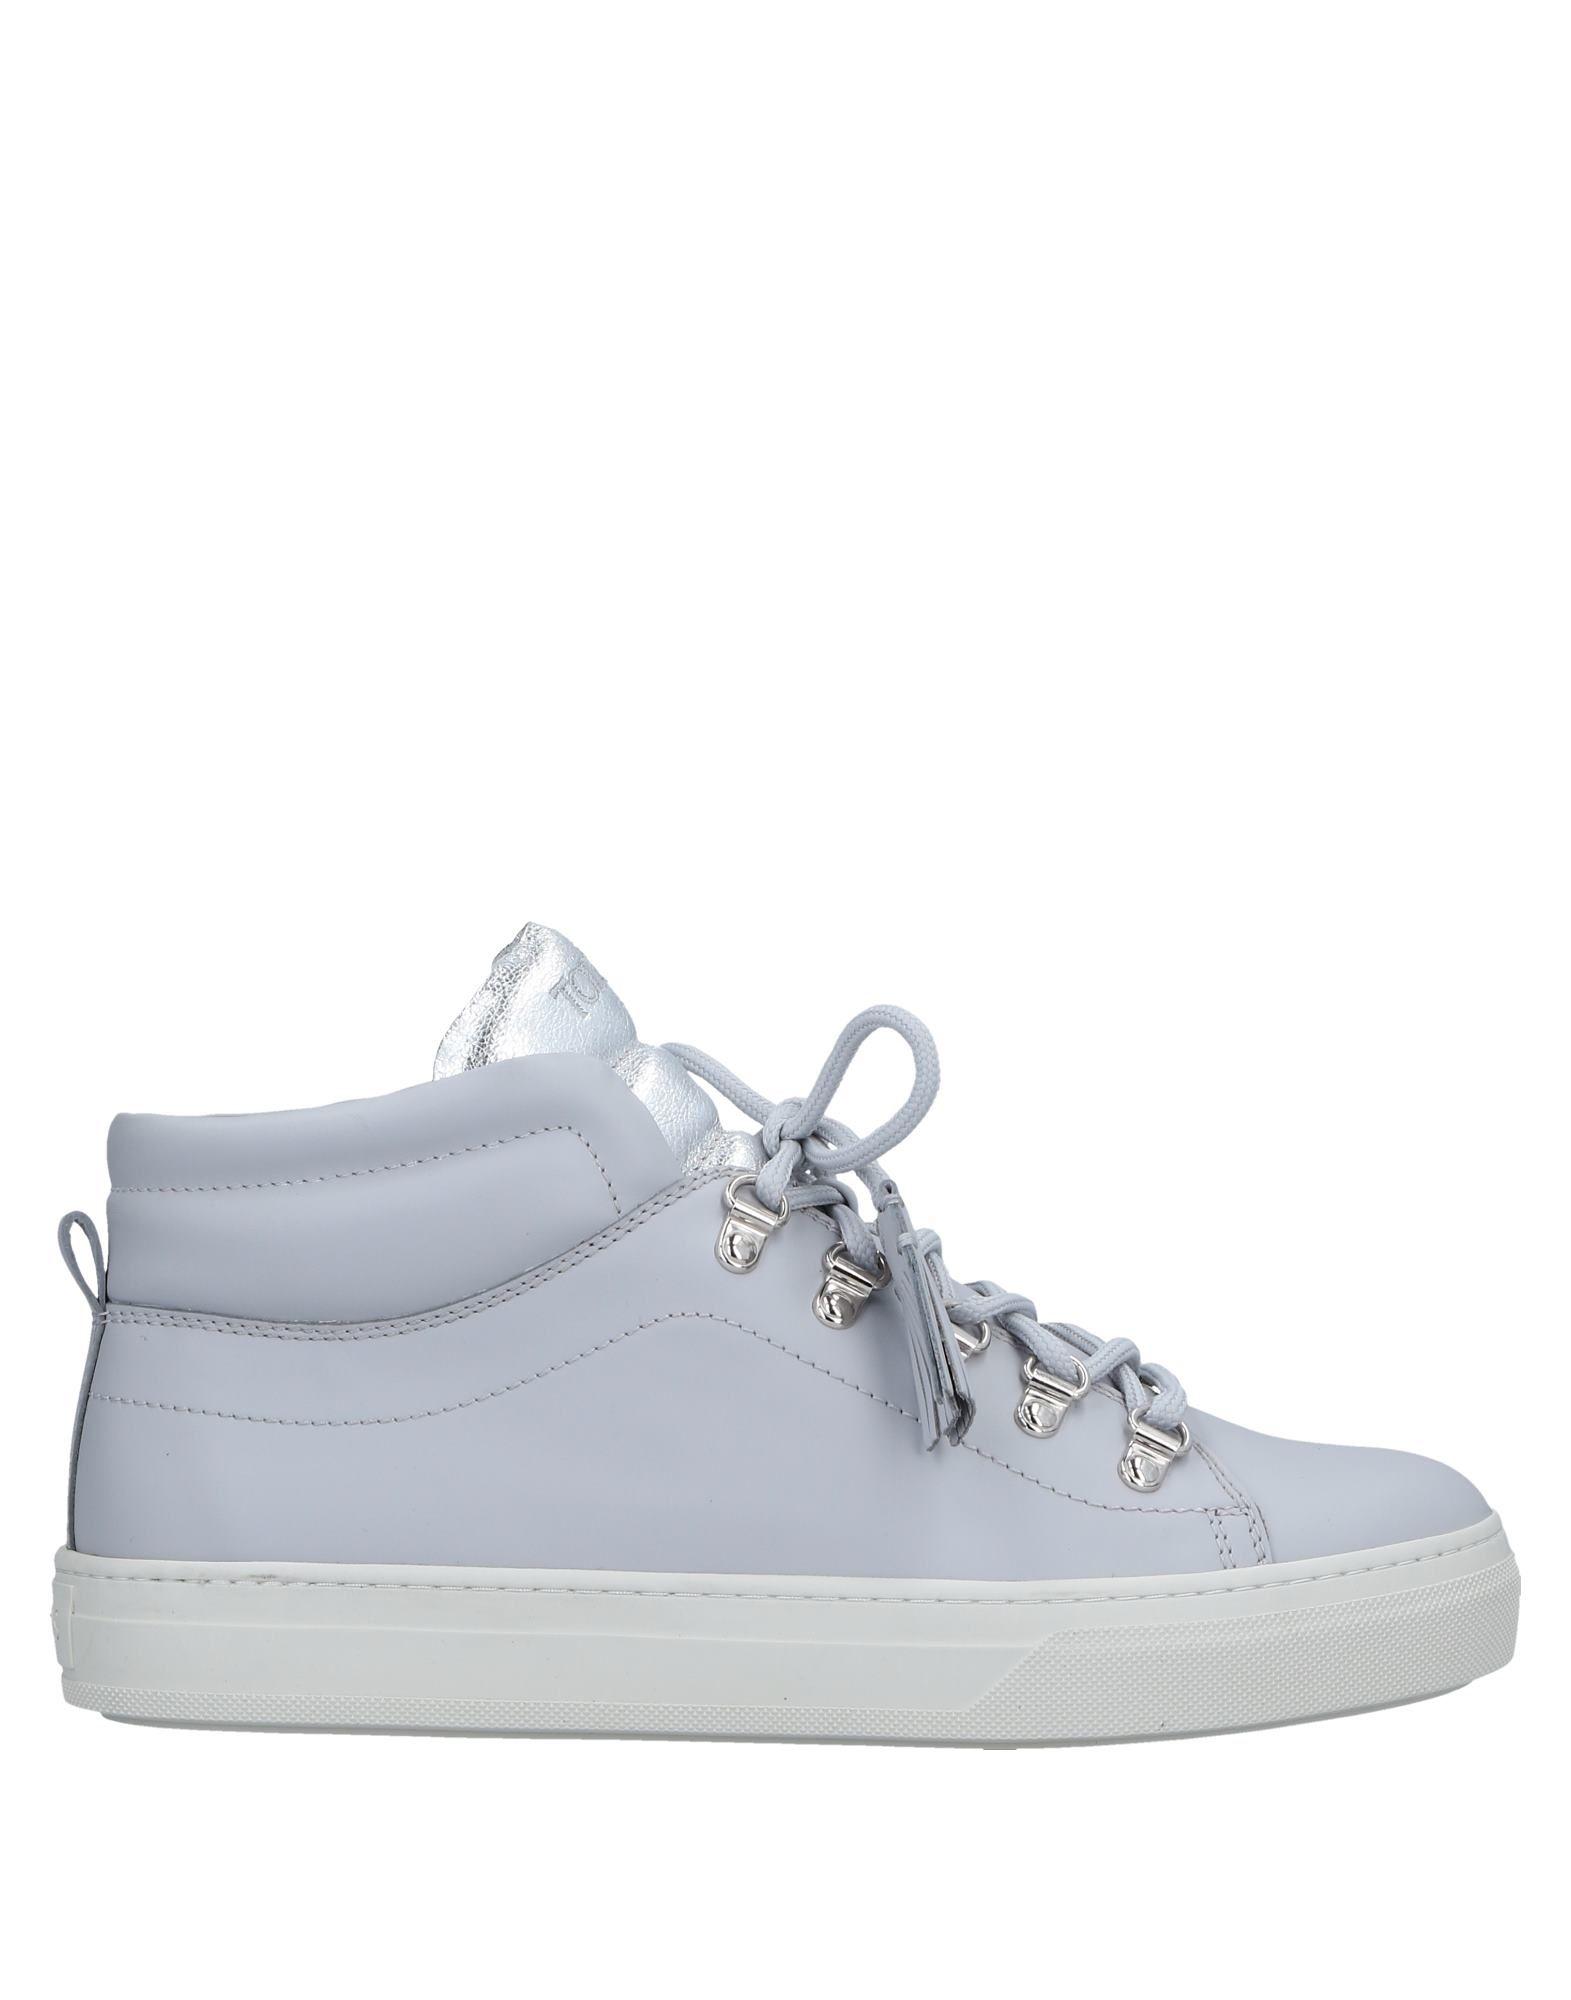 Sneakers Tod's Donna - 11542194JL elegante